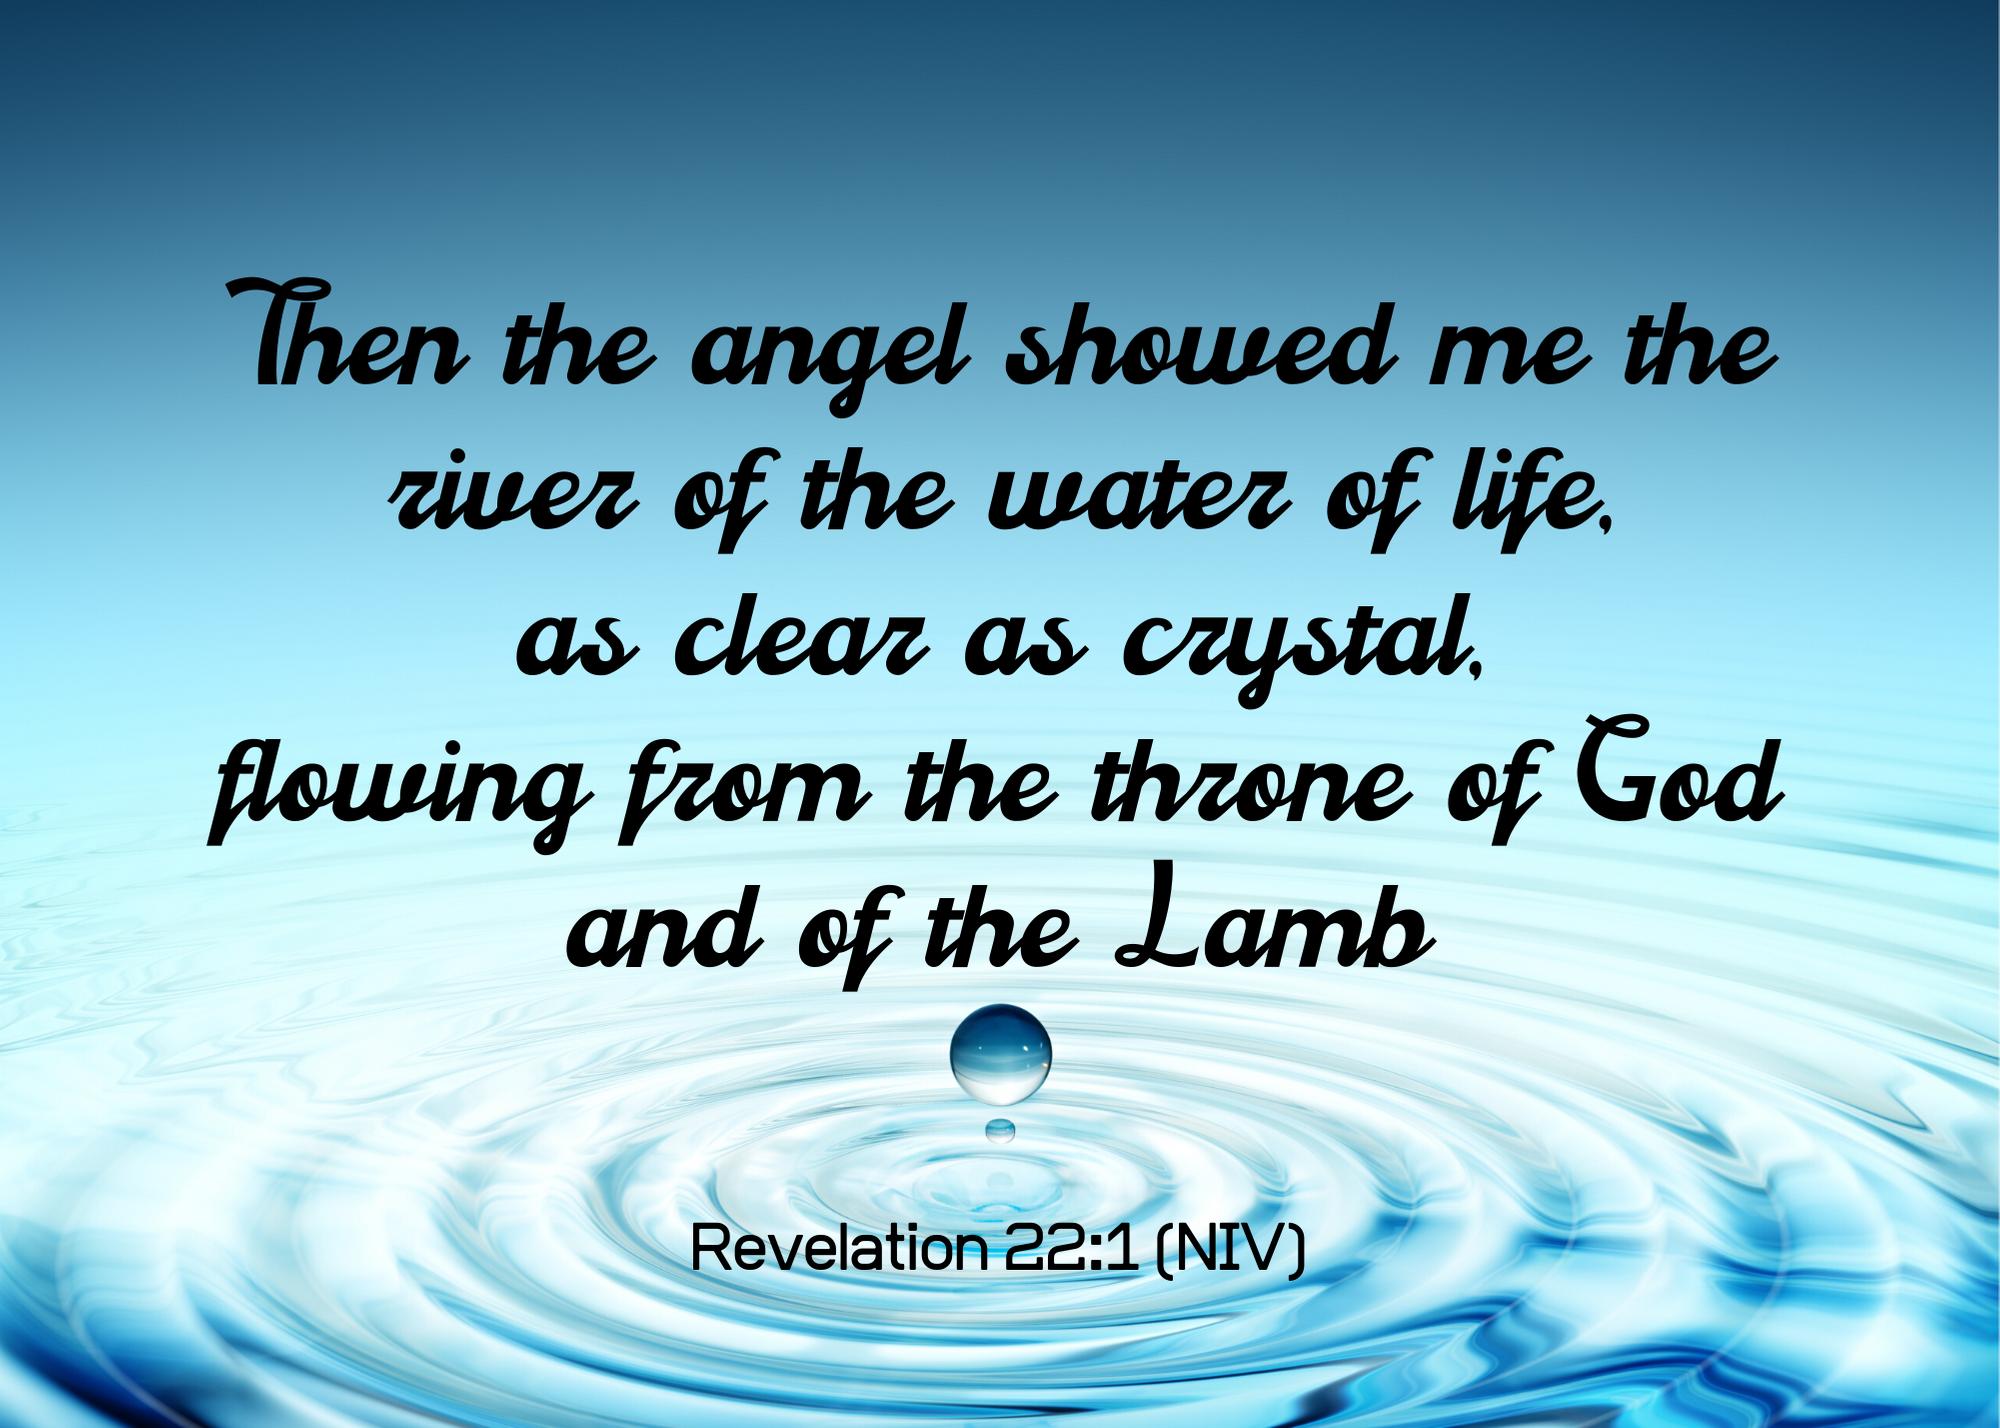 Revelation 22 1 NIV